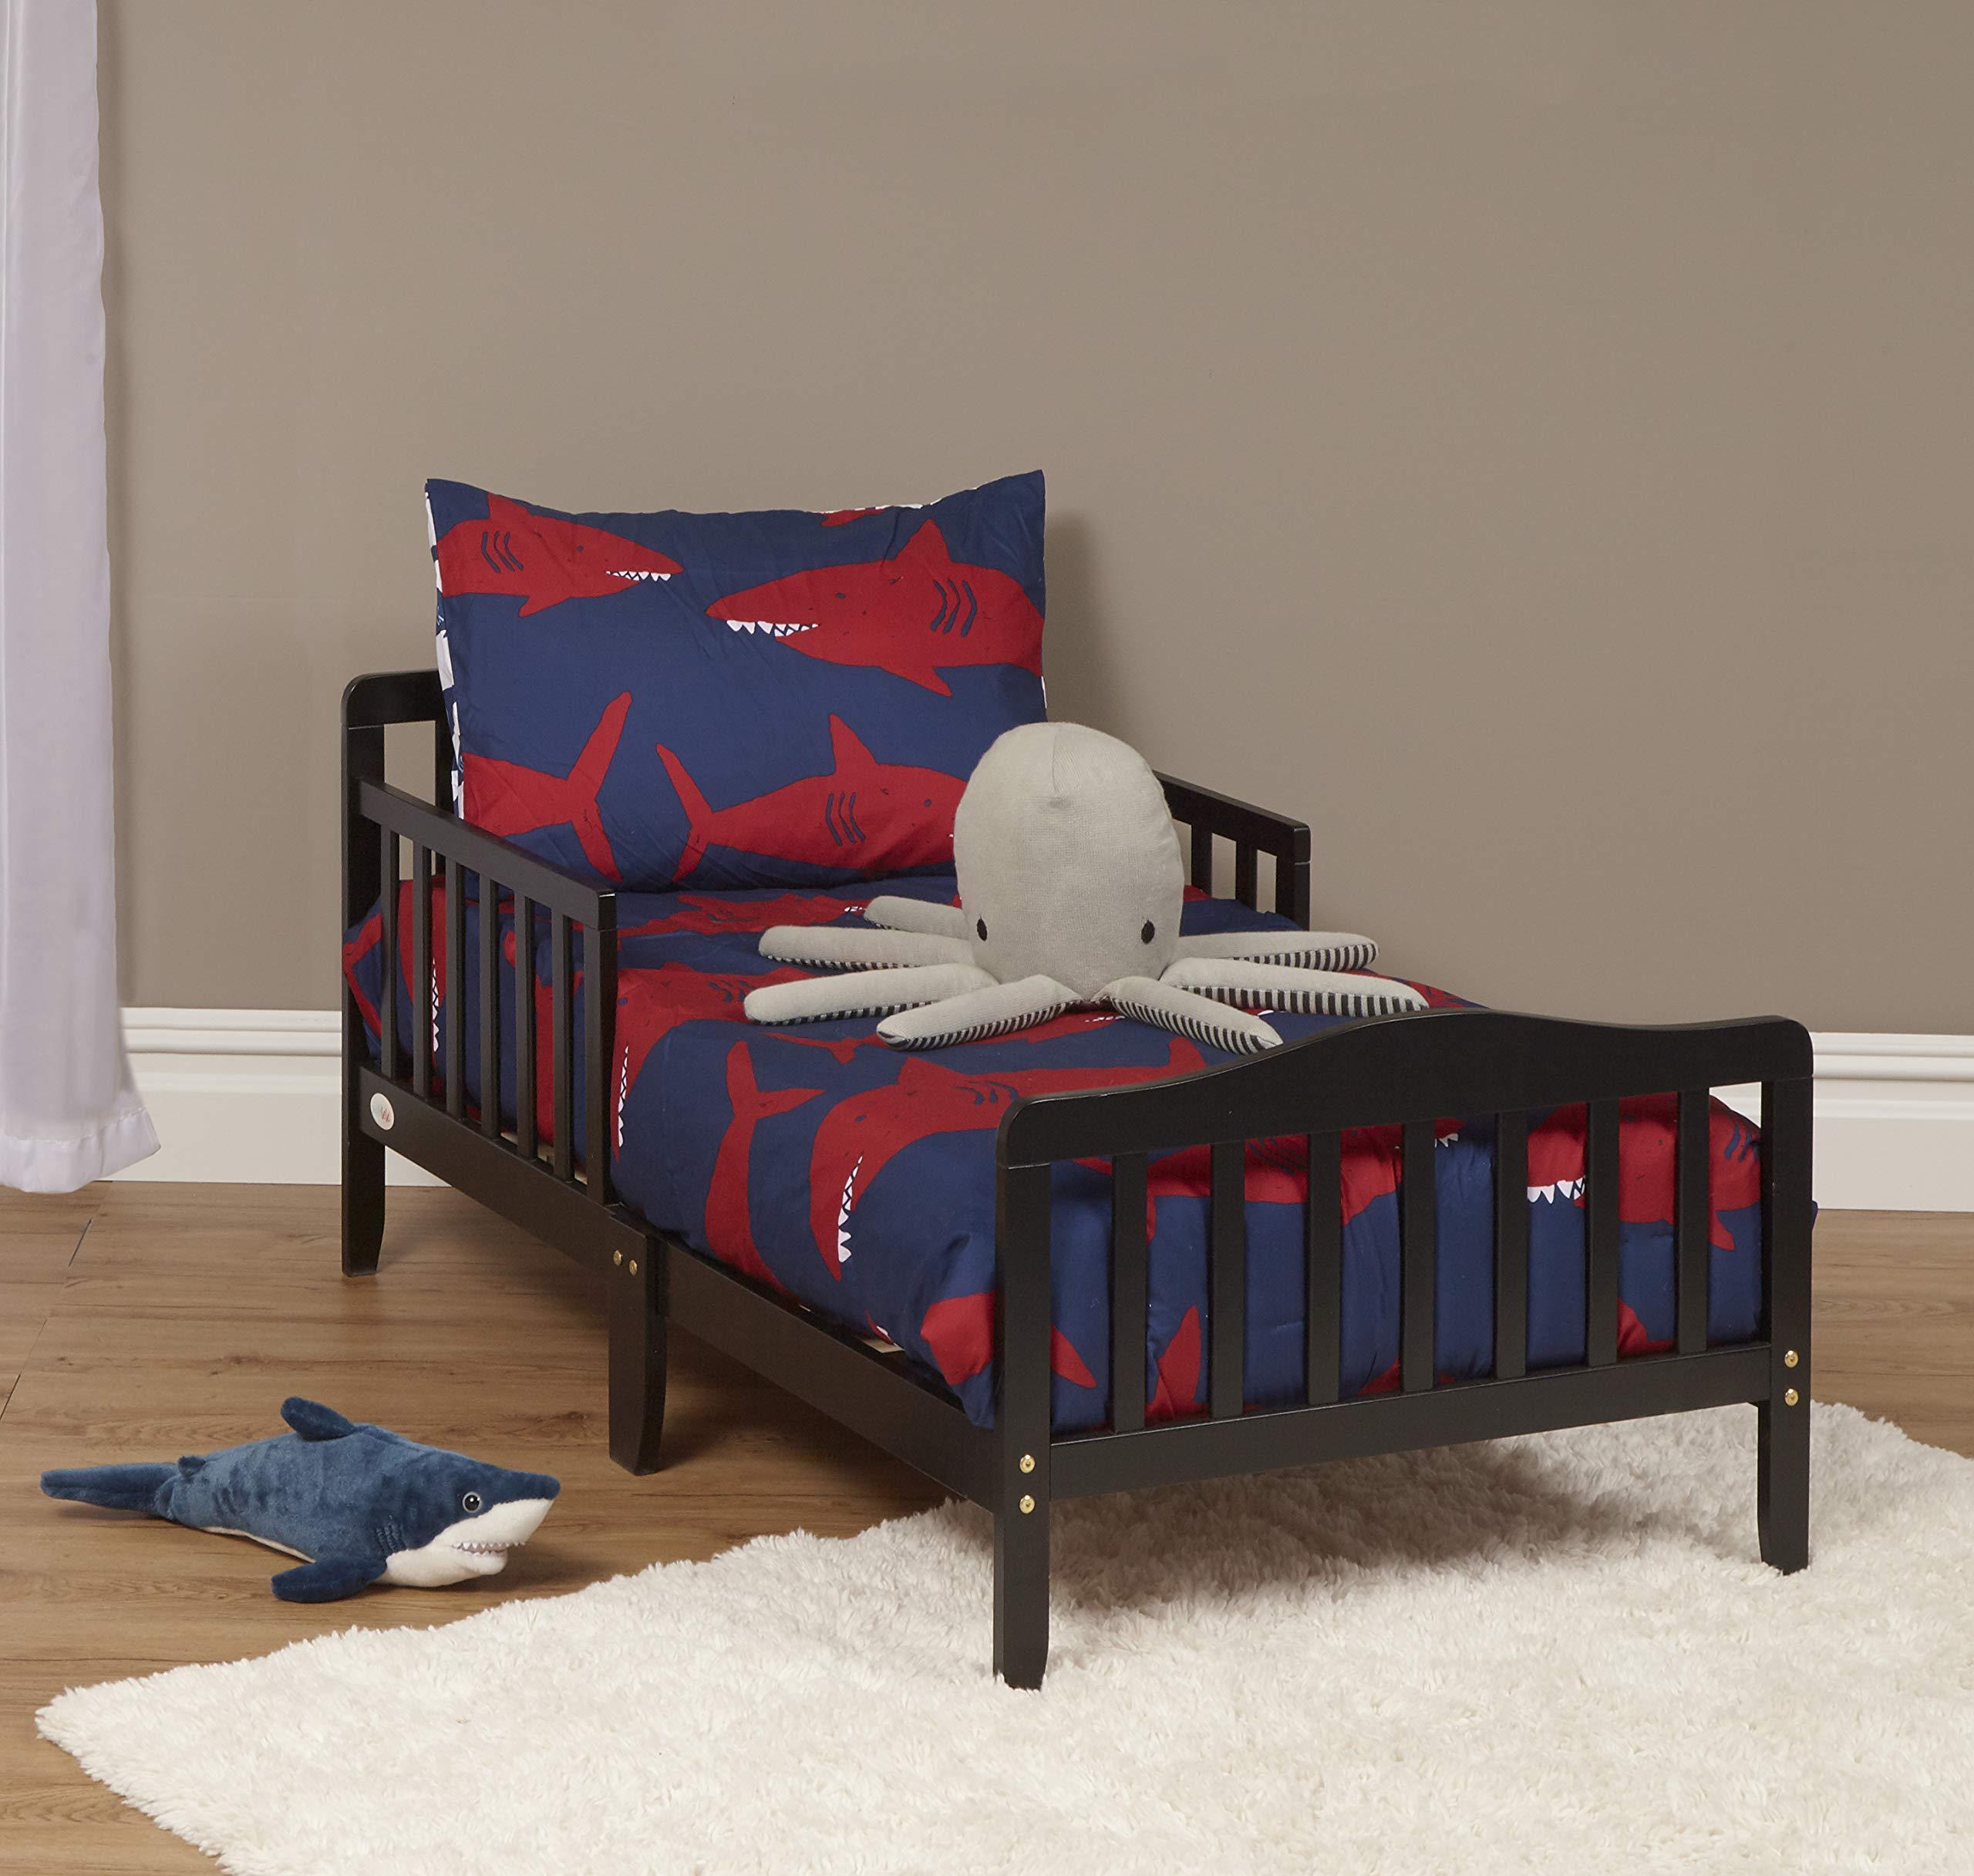 Suite Bebe Blaire Toddler Bed, Black by Suite Bebe